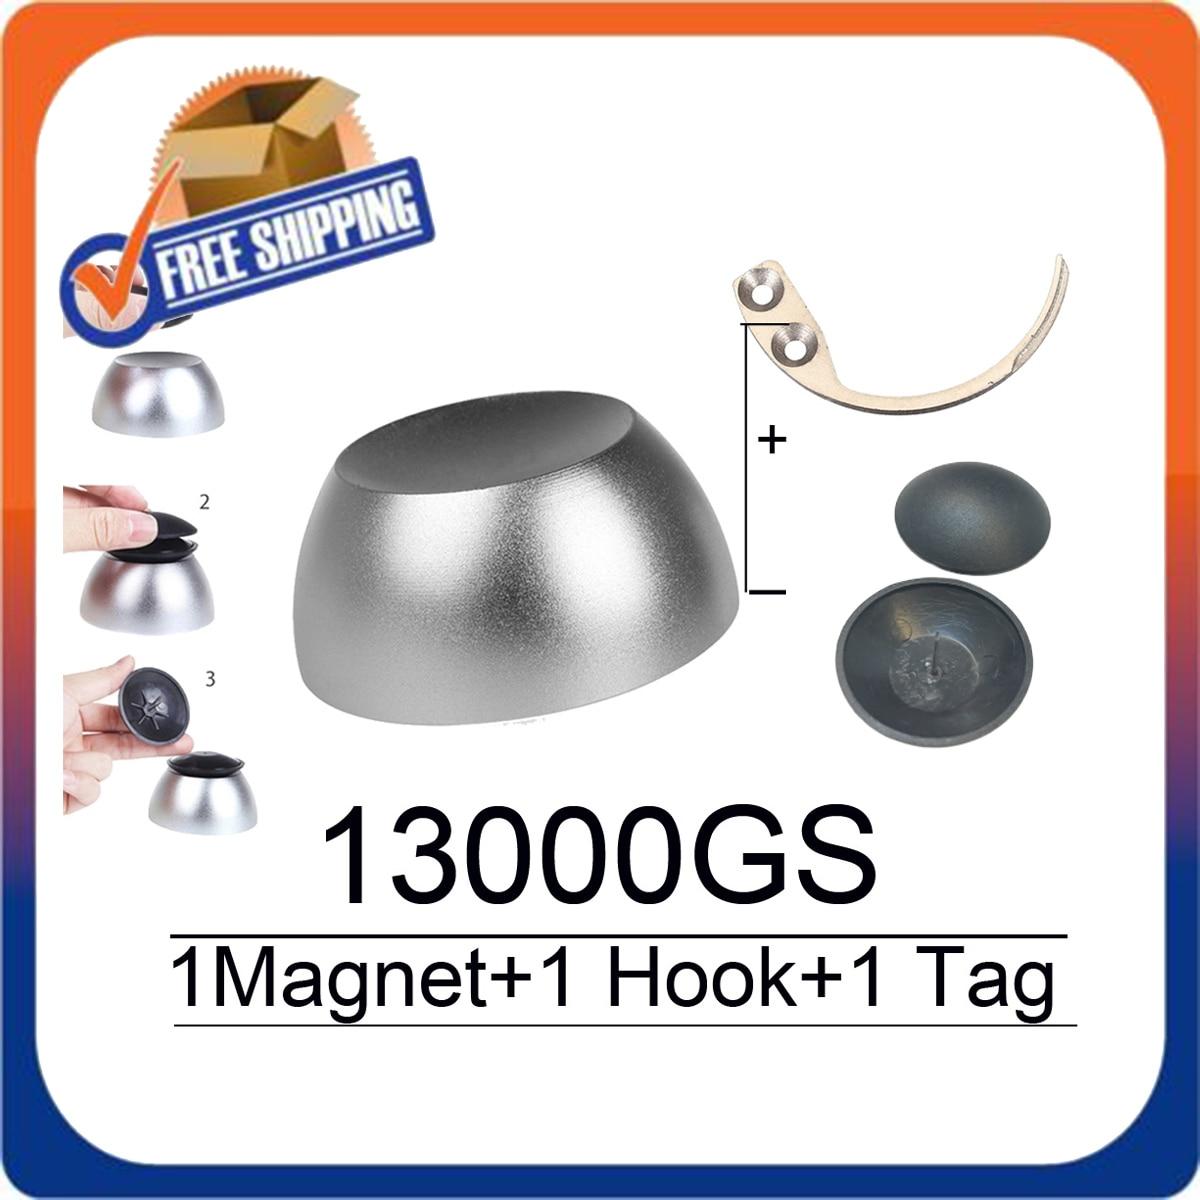 golf magnetic detacher 13000gs universal tag removedor ima 1 chave destacador gancho destacador 1 golfe tag